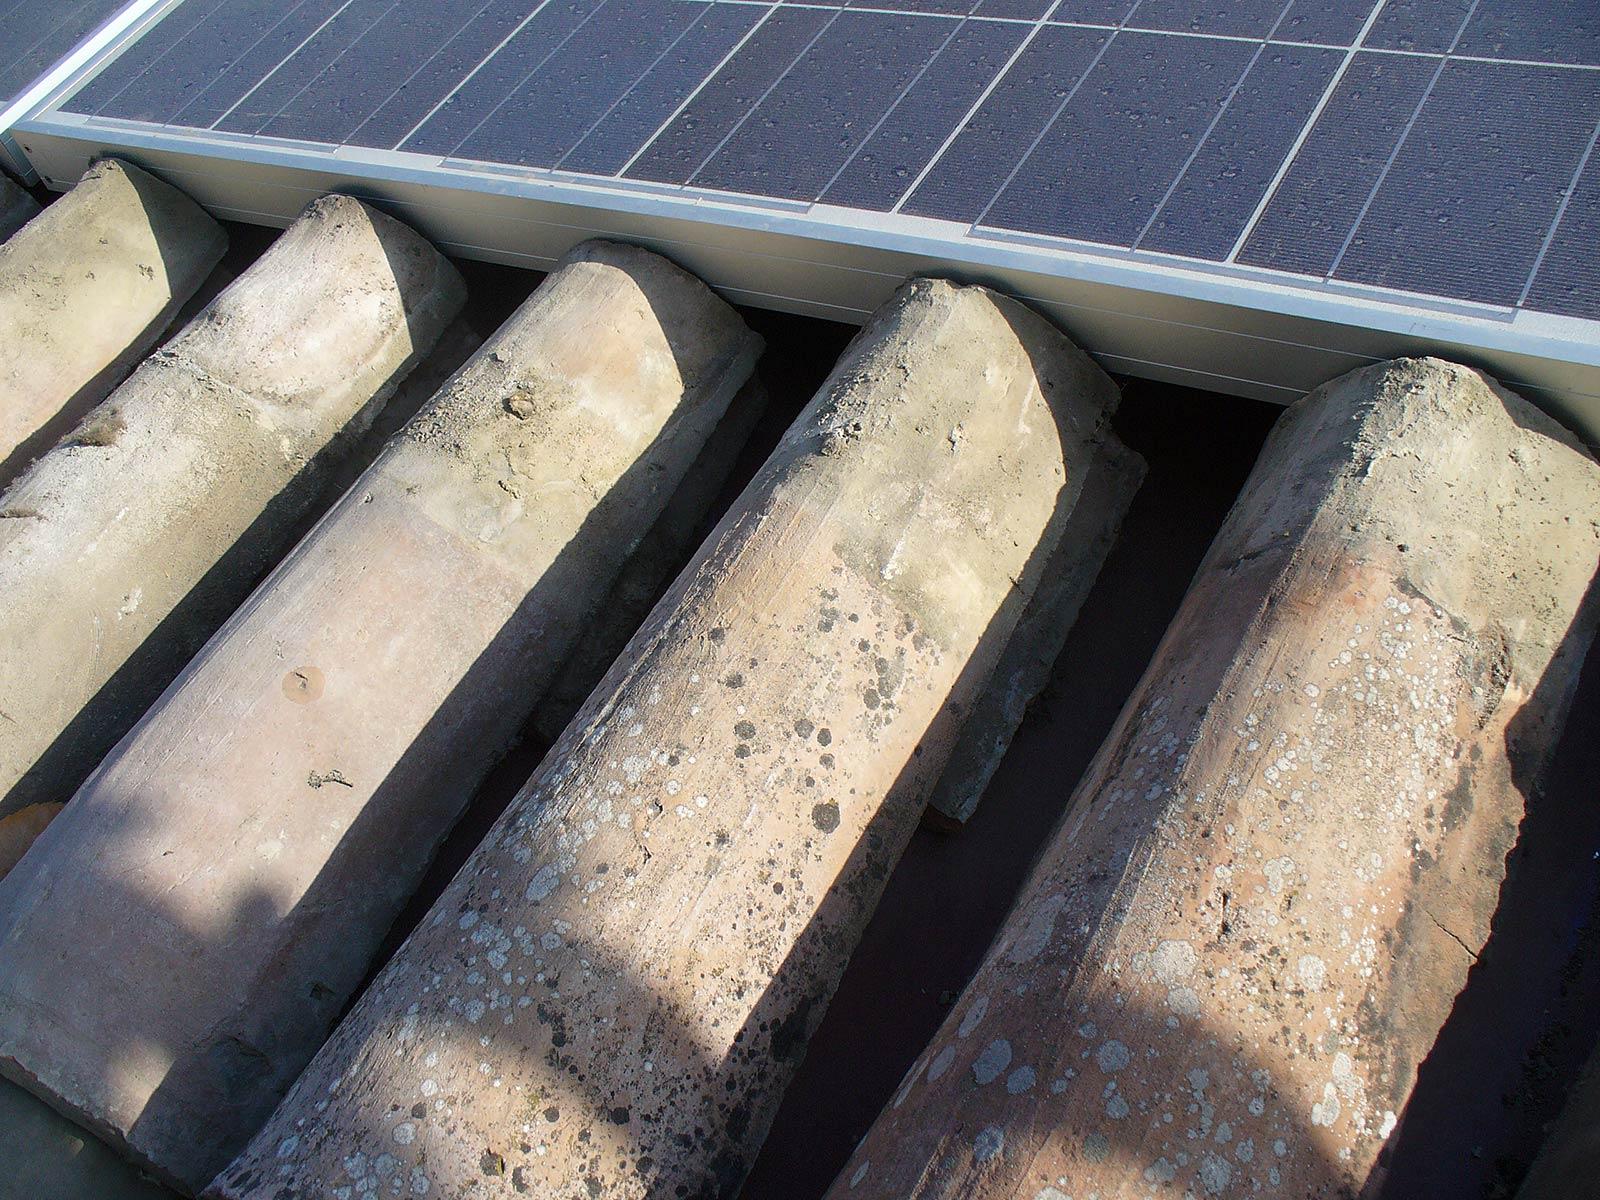 pannelli-fotovoltaici-3